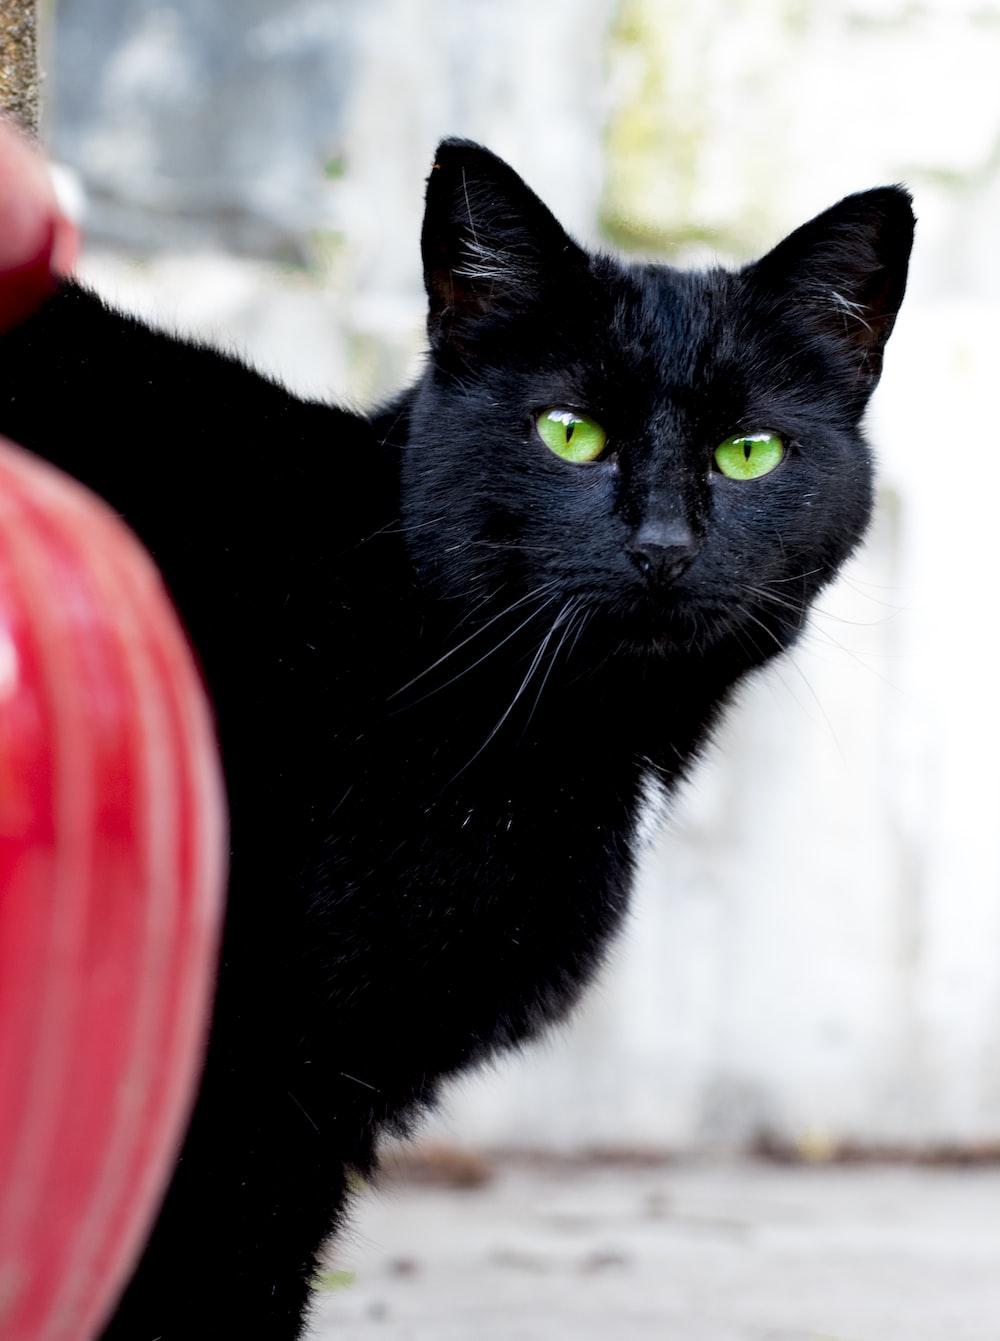 black cat on red plastic container